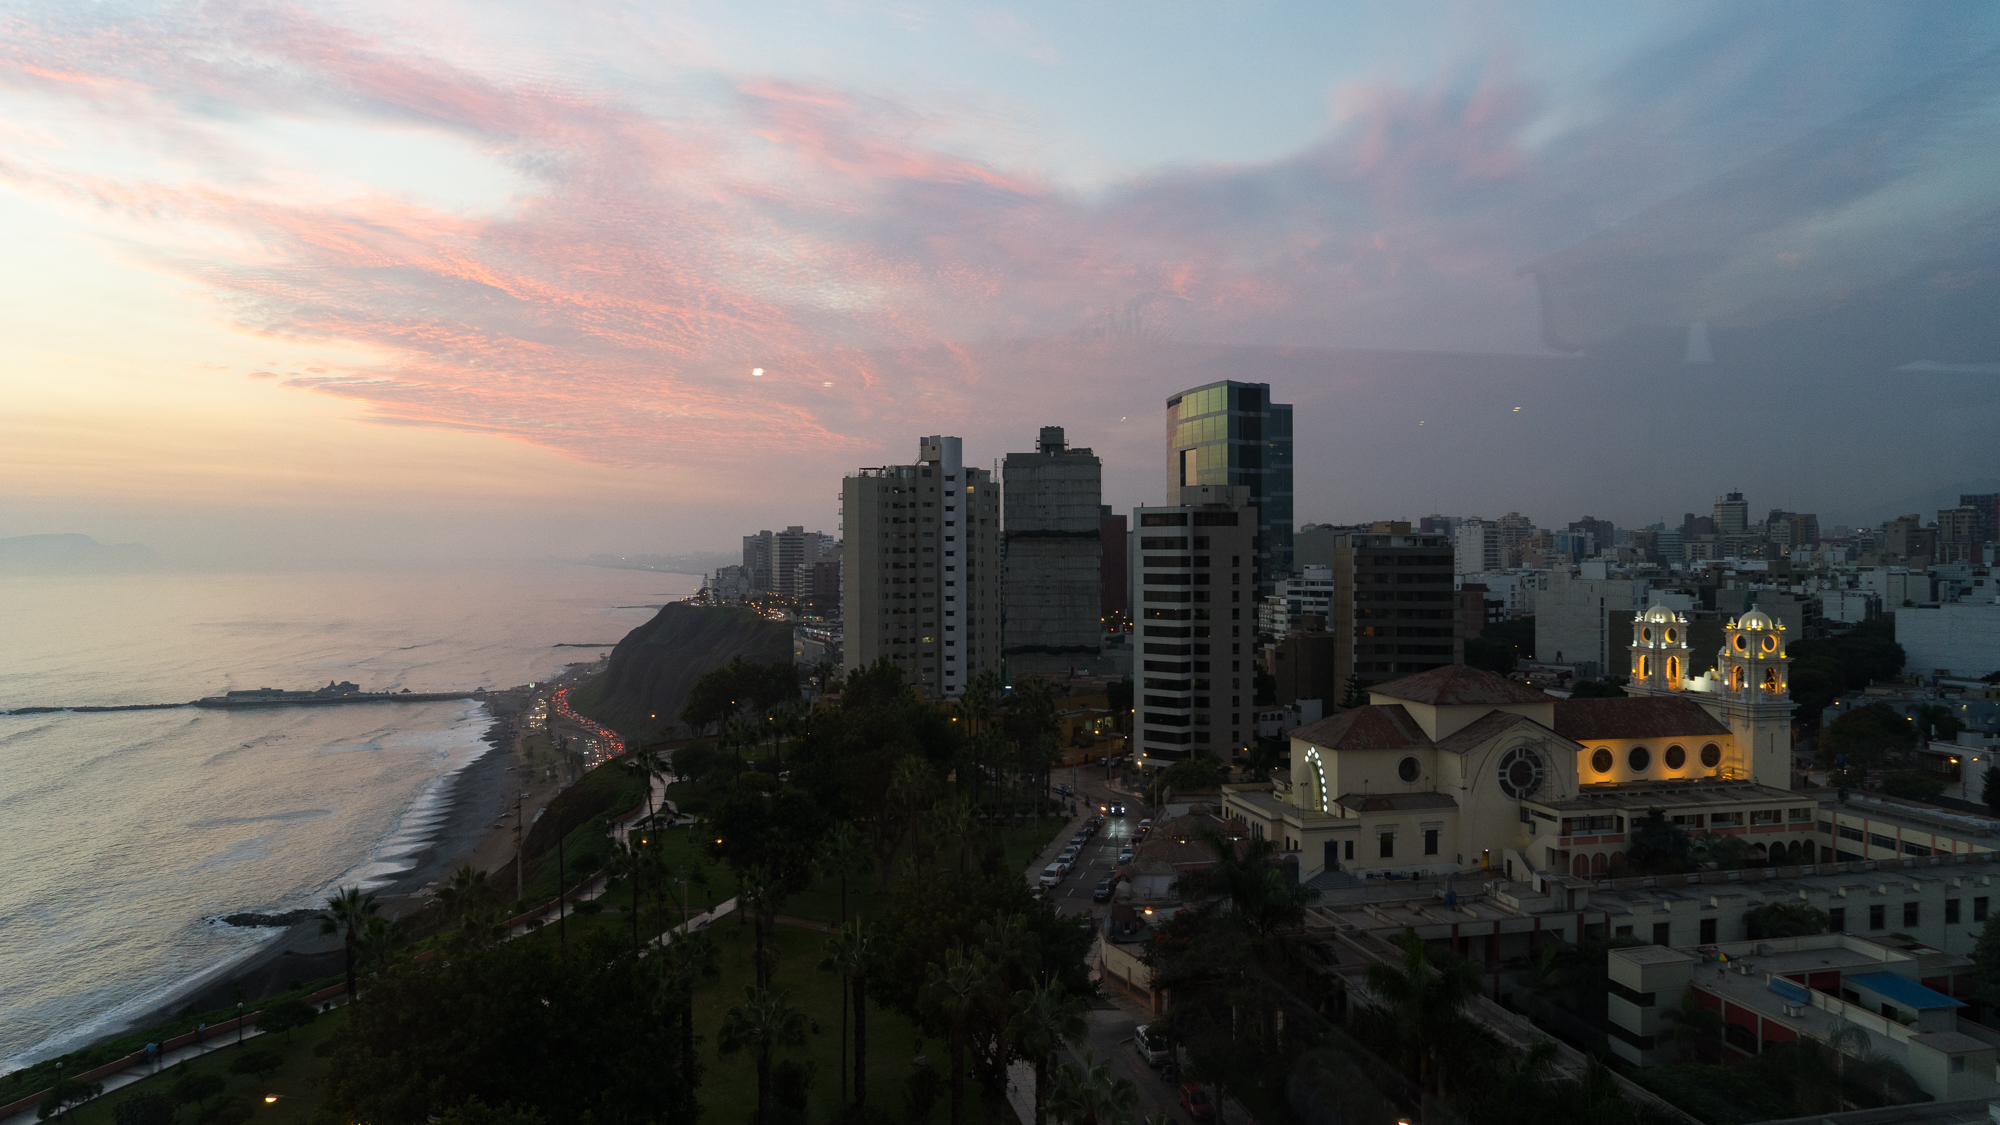 Daytripper 365-Lima (13 of 13).jpg